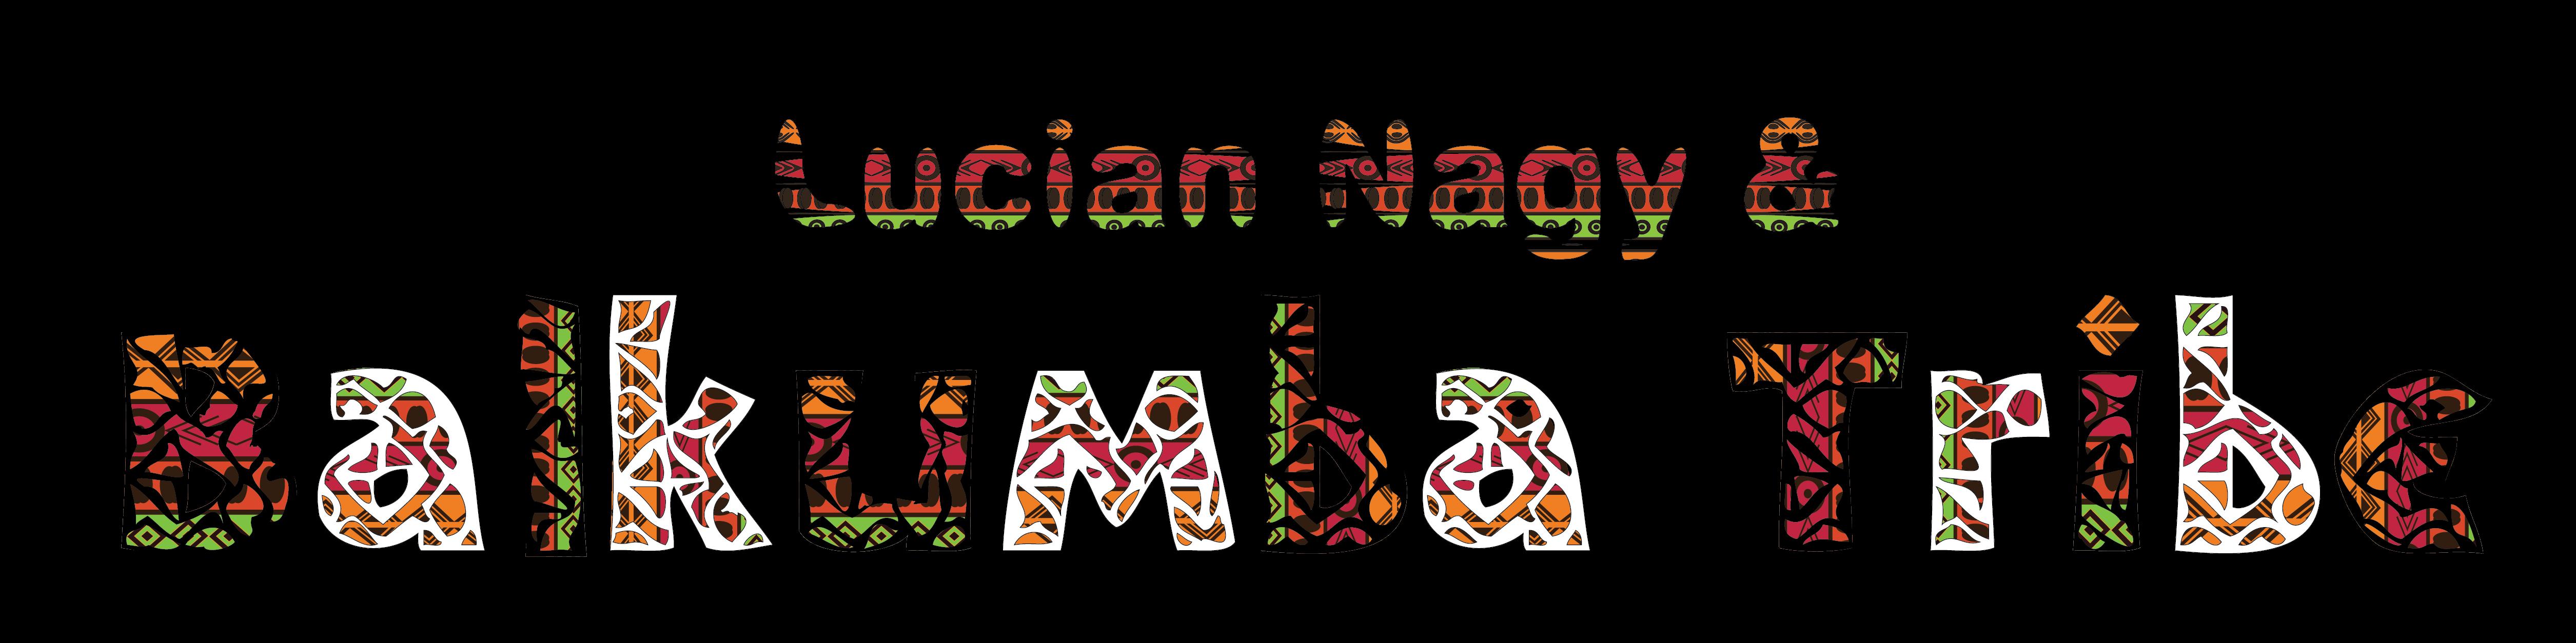 Lucian nagy balkumba tribe. Jazz clipart jazz club